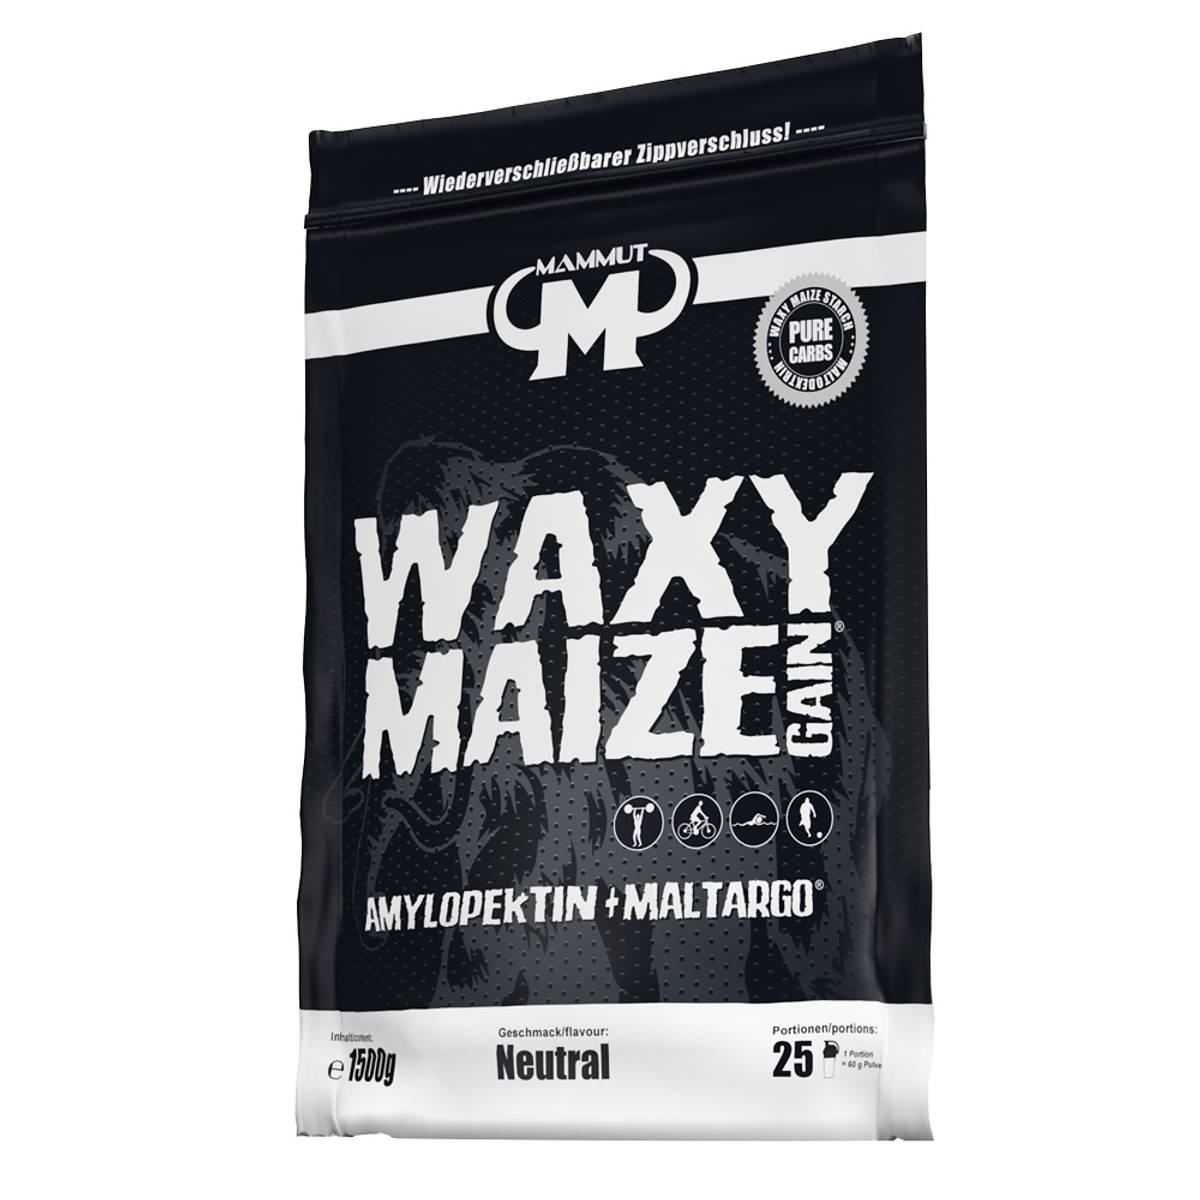 Waxy Maize Gain - 1500g